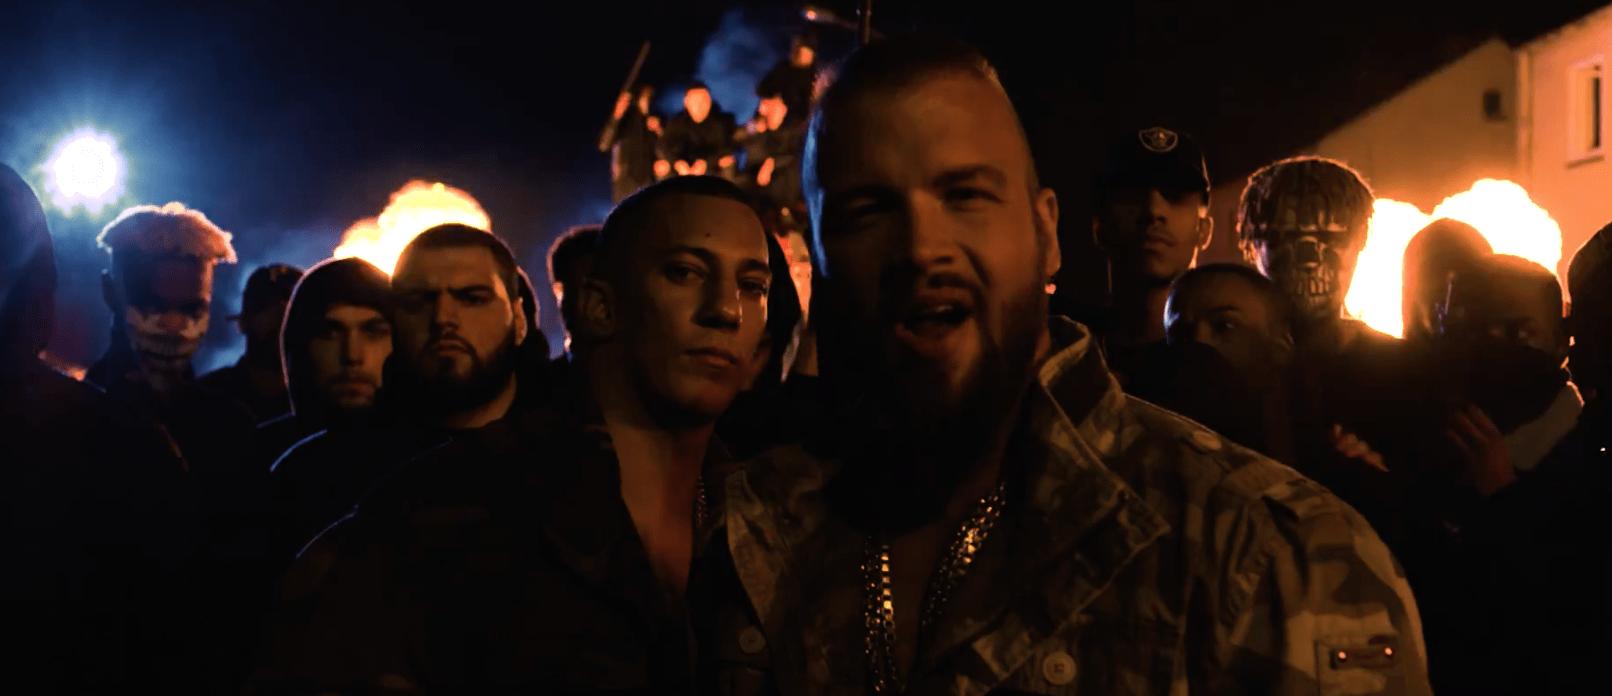 Kollegah & Farid Bang - Sturmmaske auf (Musikvideo)